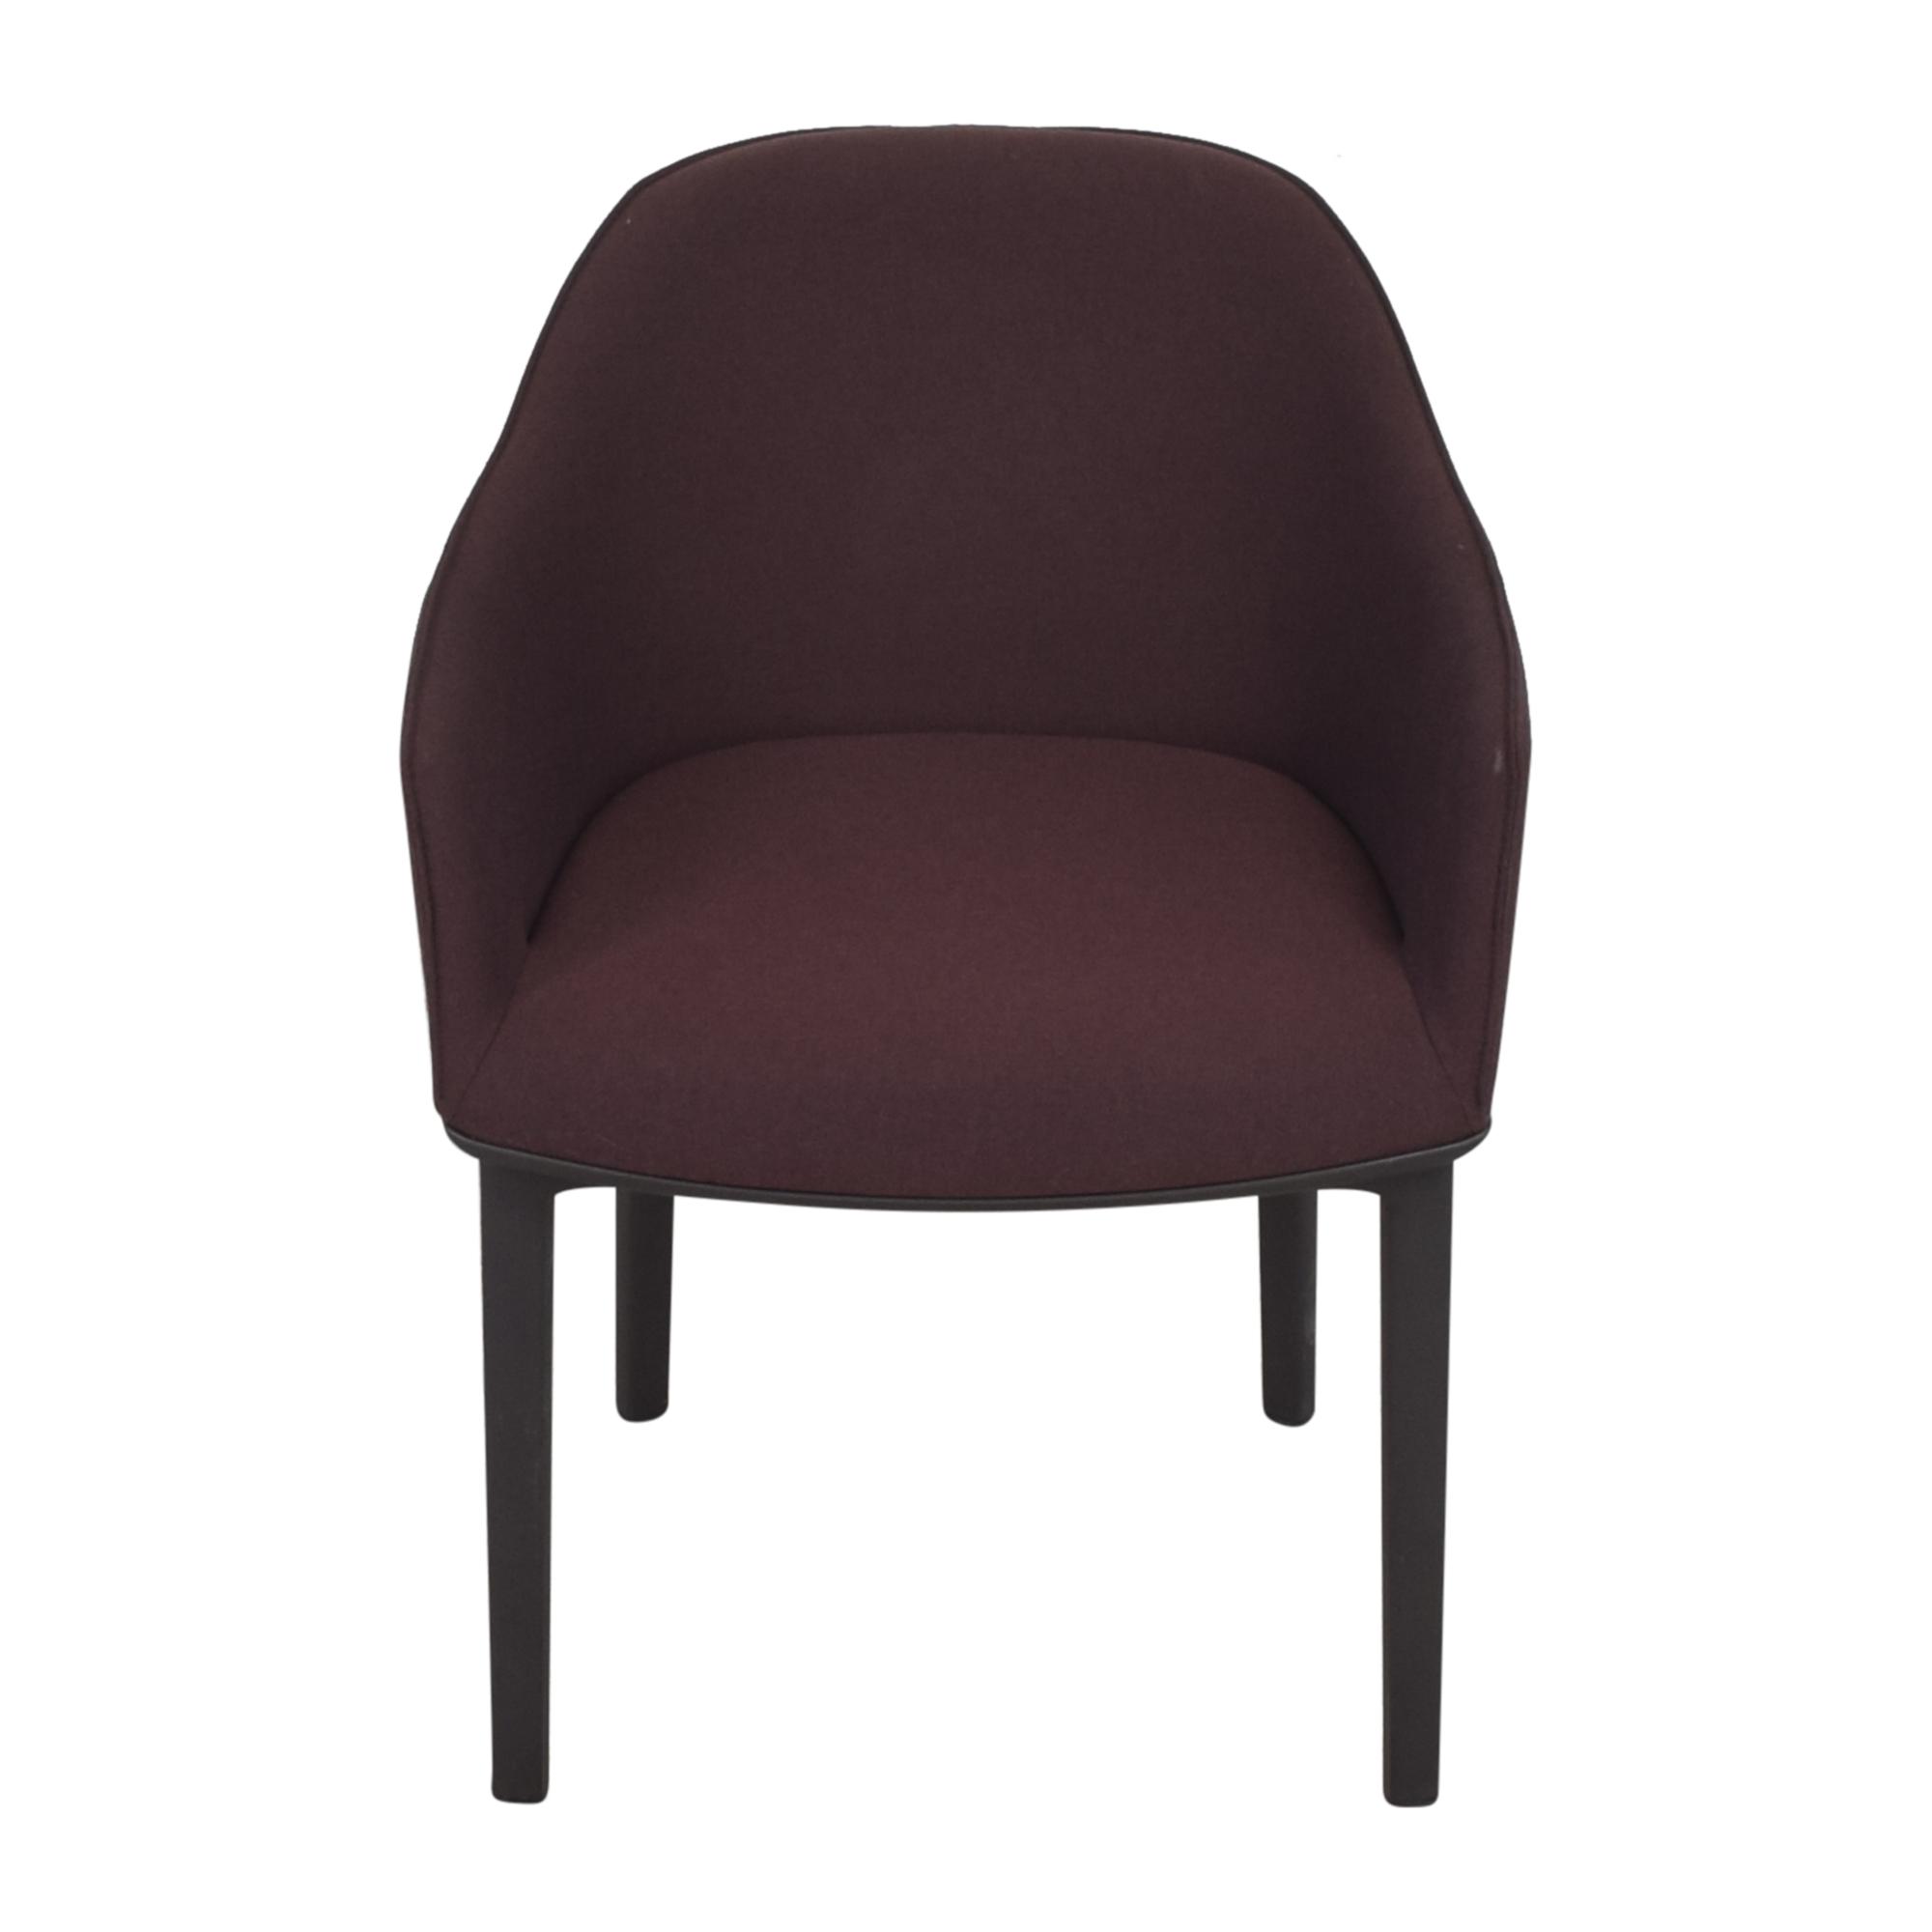 Vitra Softshell Arm Chair / Chairs